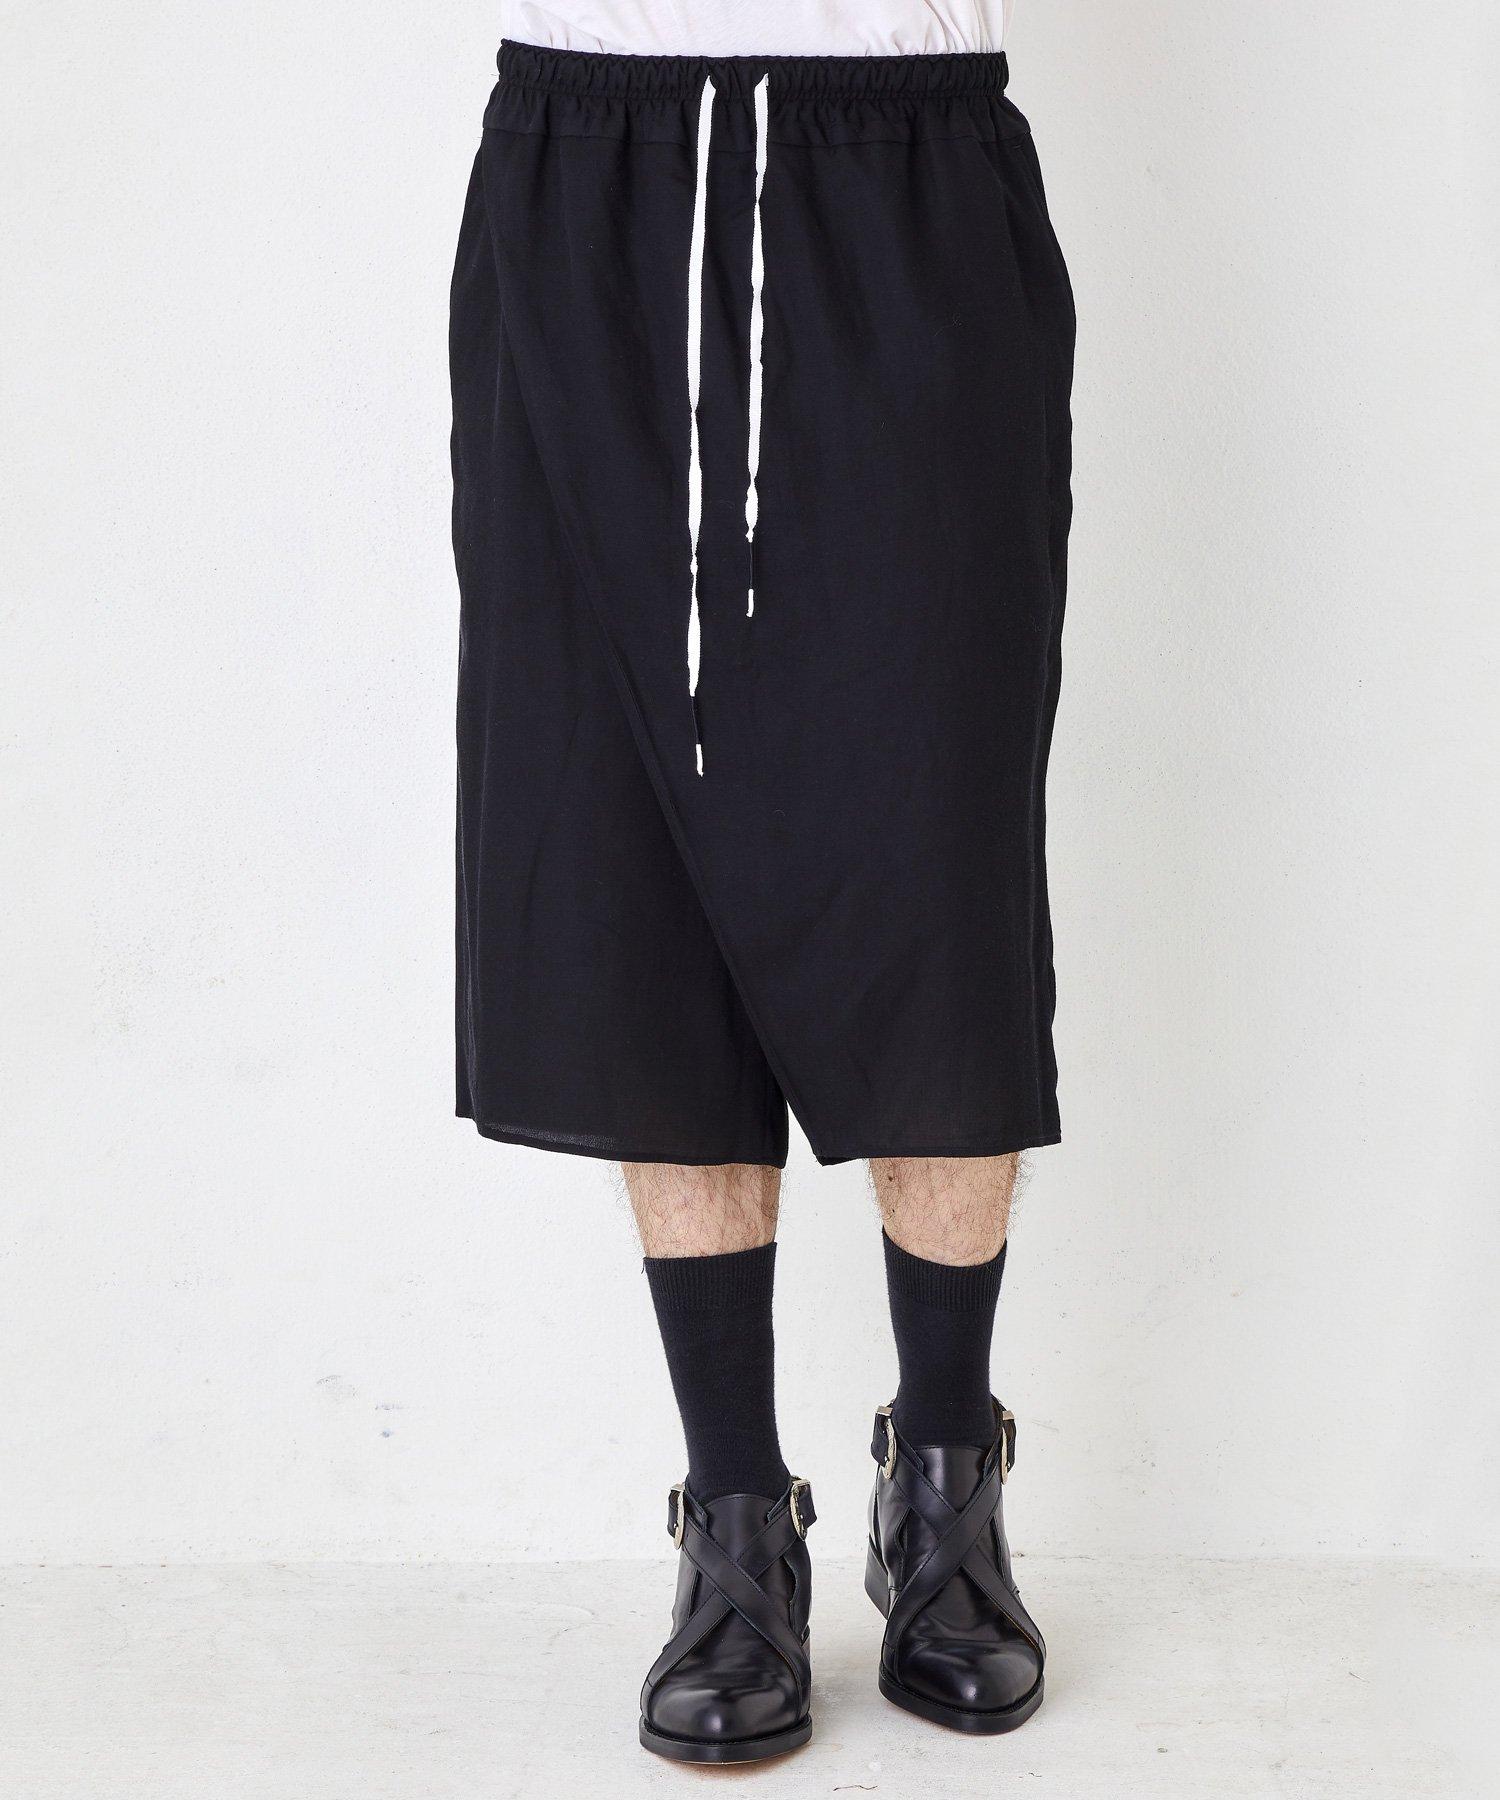 SKIRT SHORTS【Black】